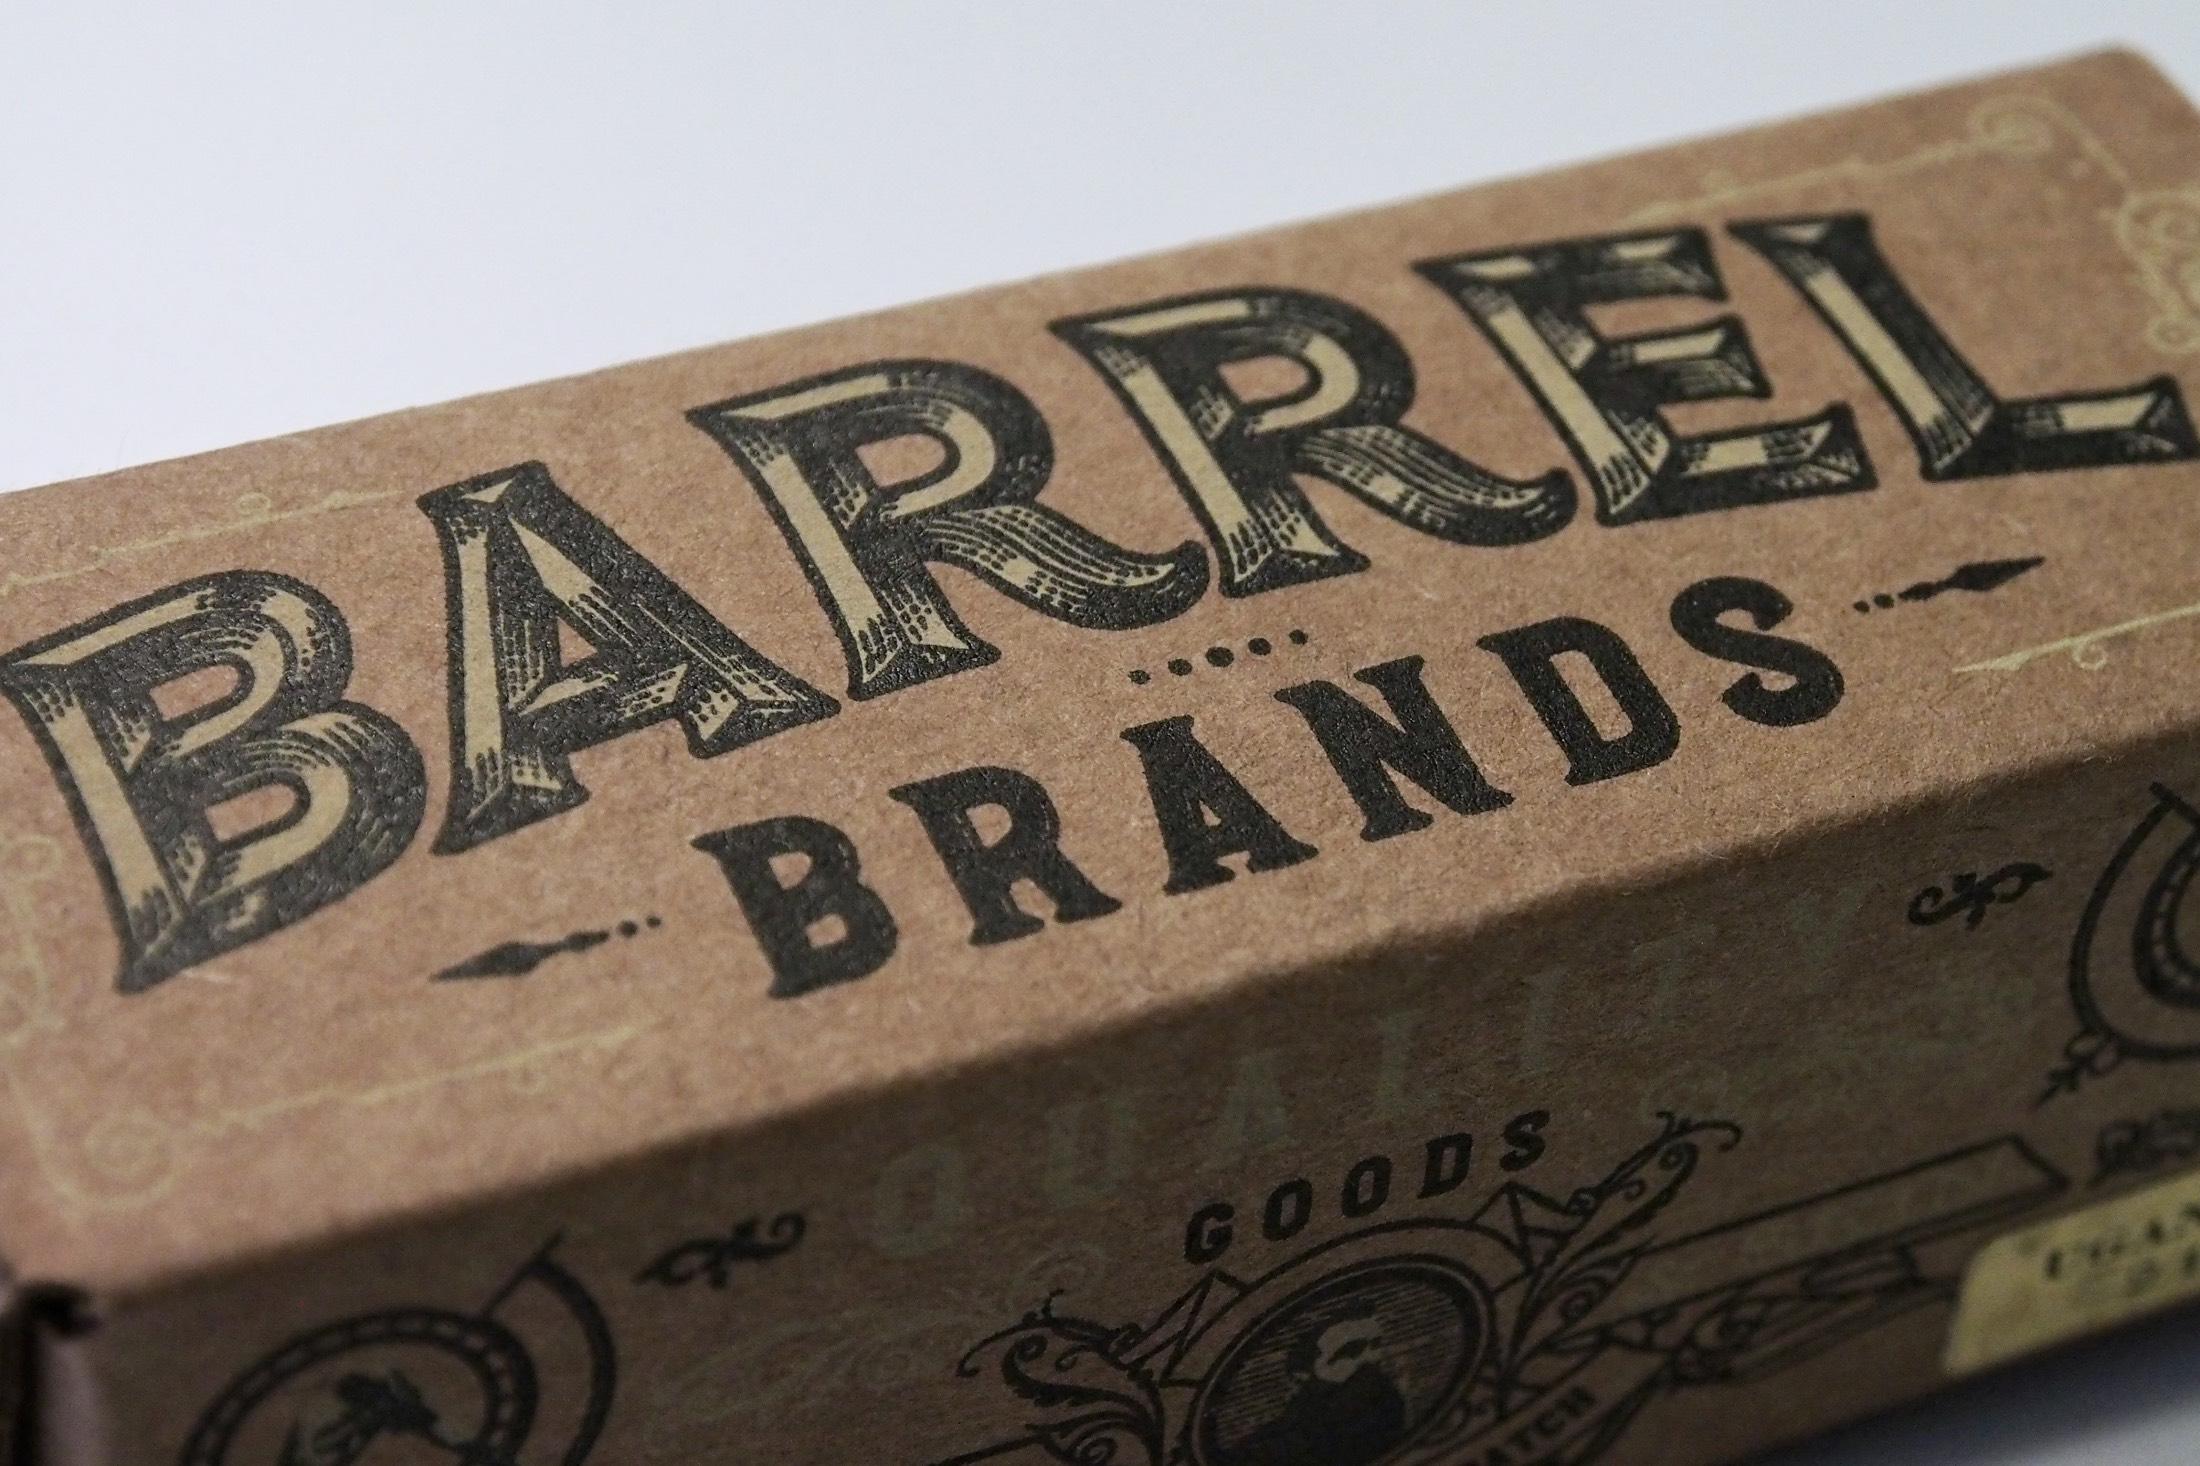 Barrel brands: uganda brewer´s collaboration zoomlab